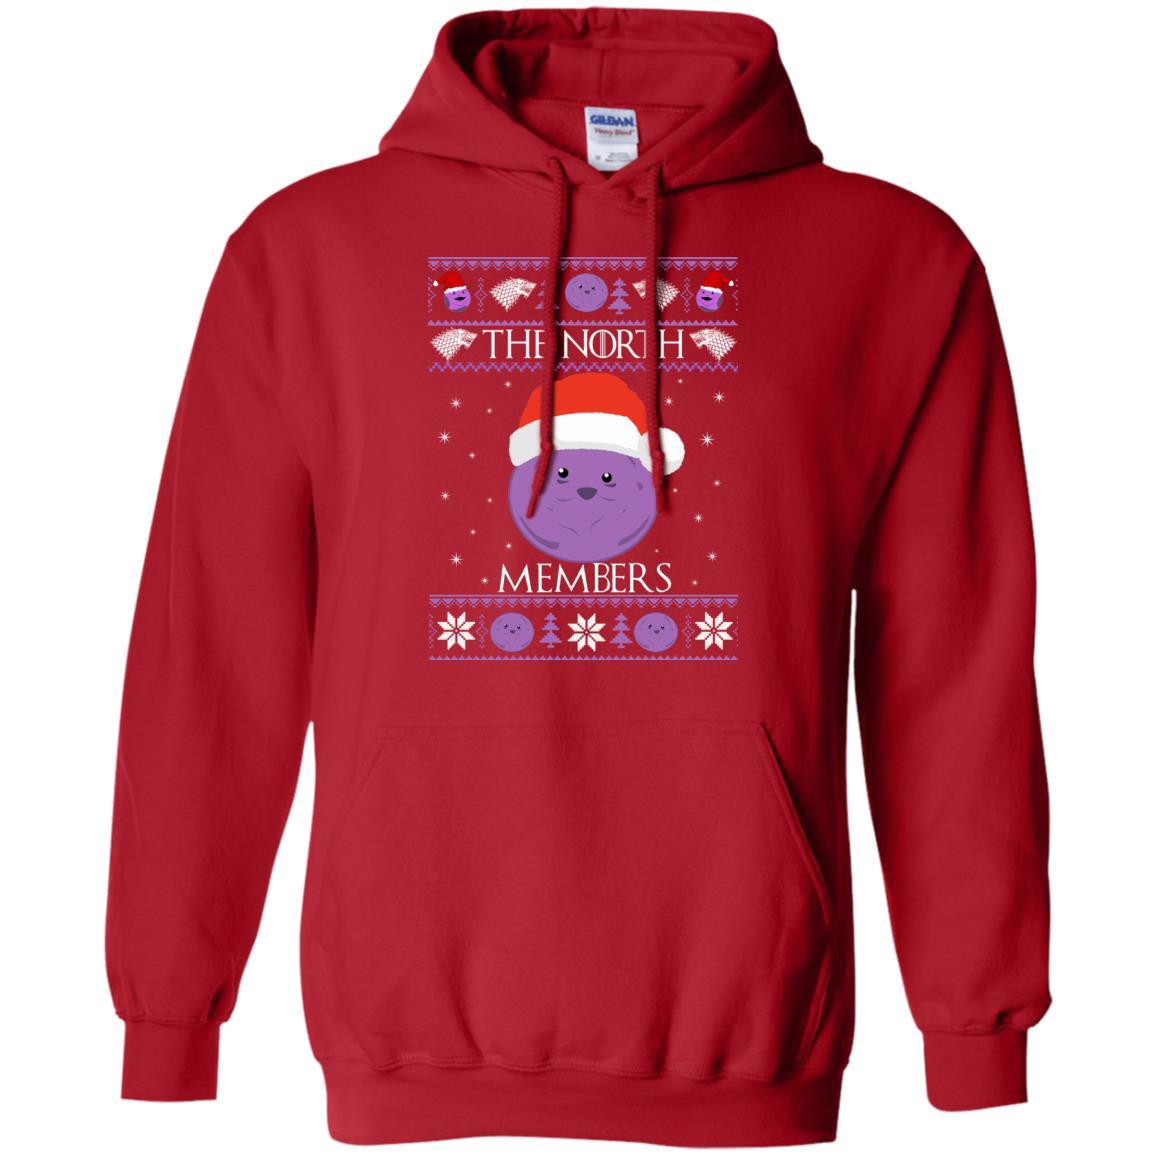 image 4784 - The North Members Christmas Sweater, Hoodie